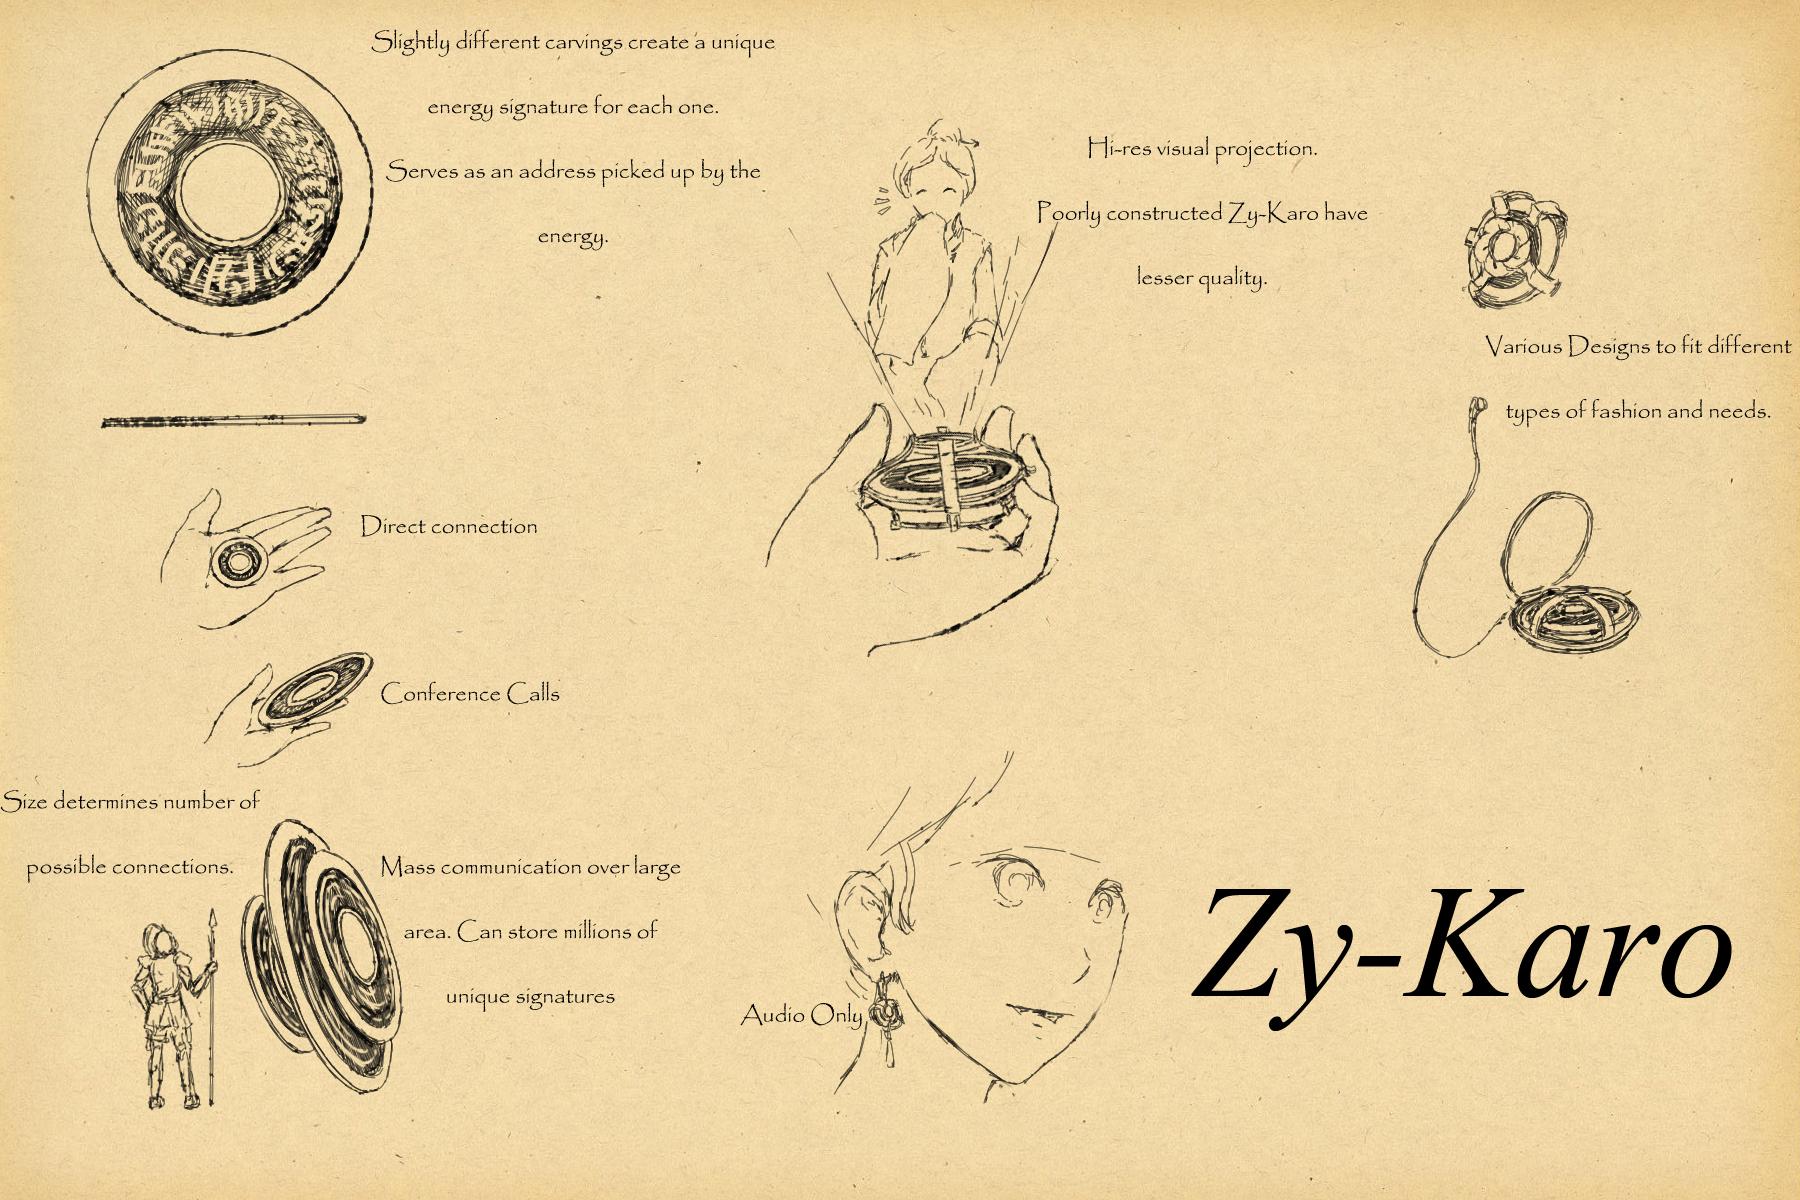 Zy-Karo.jpg